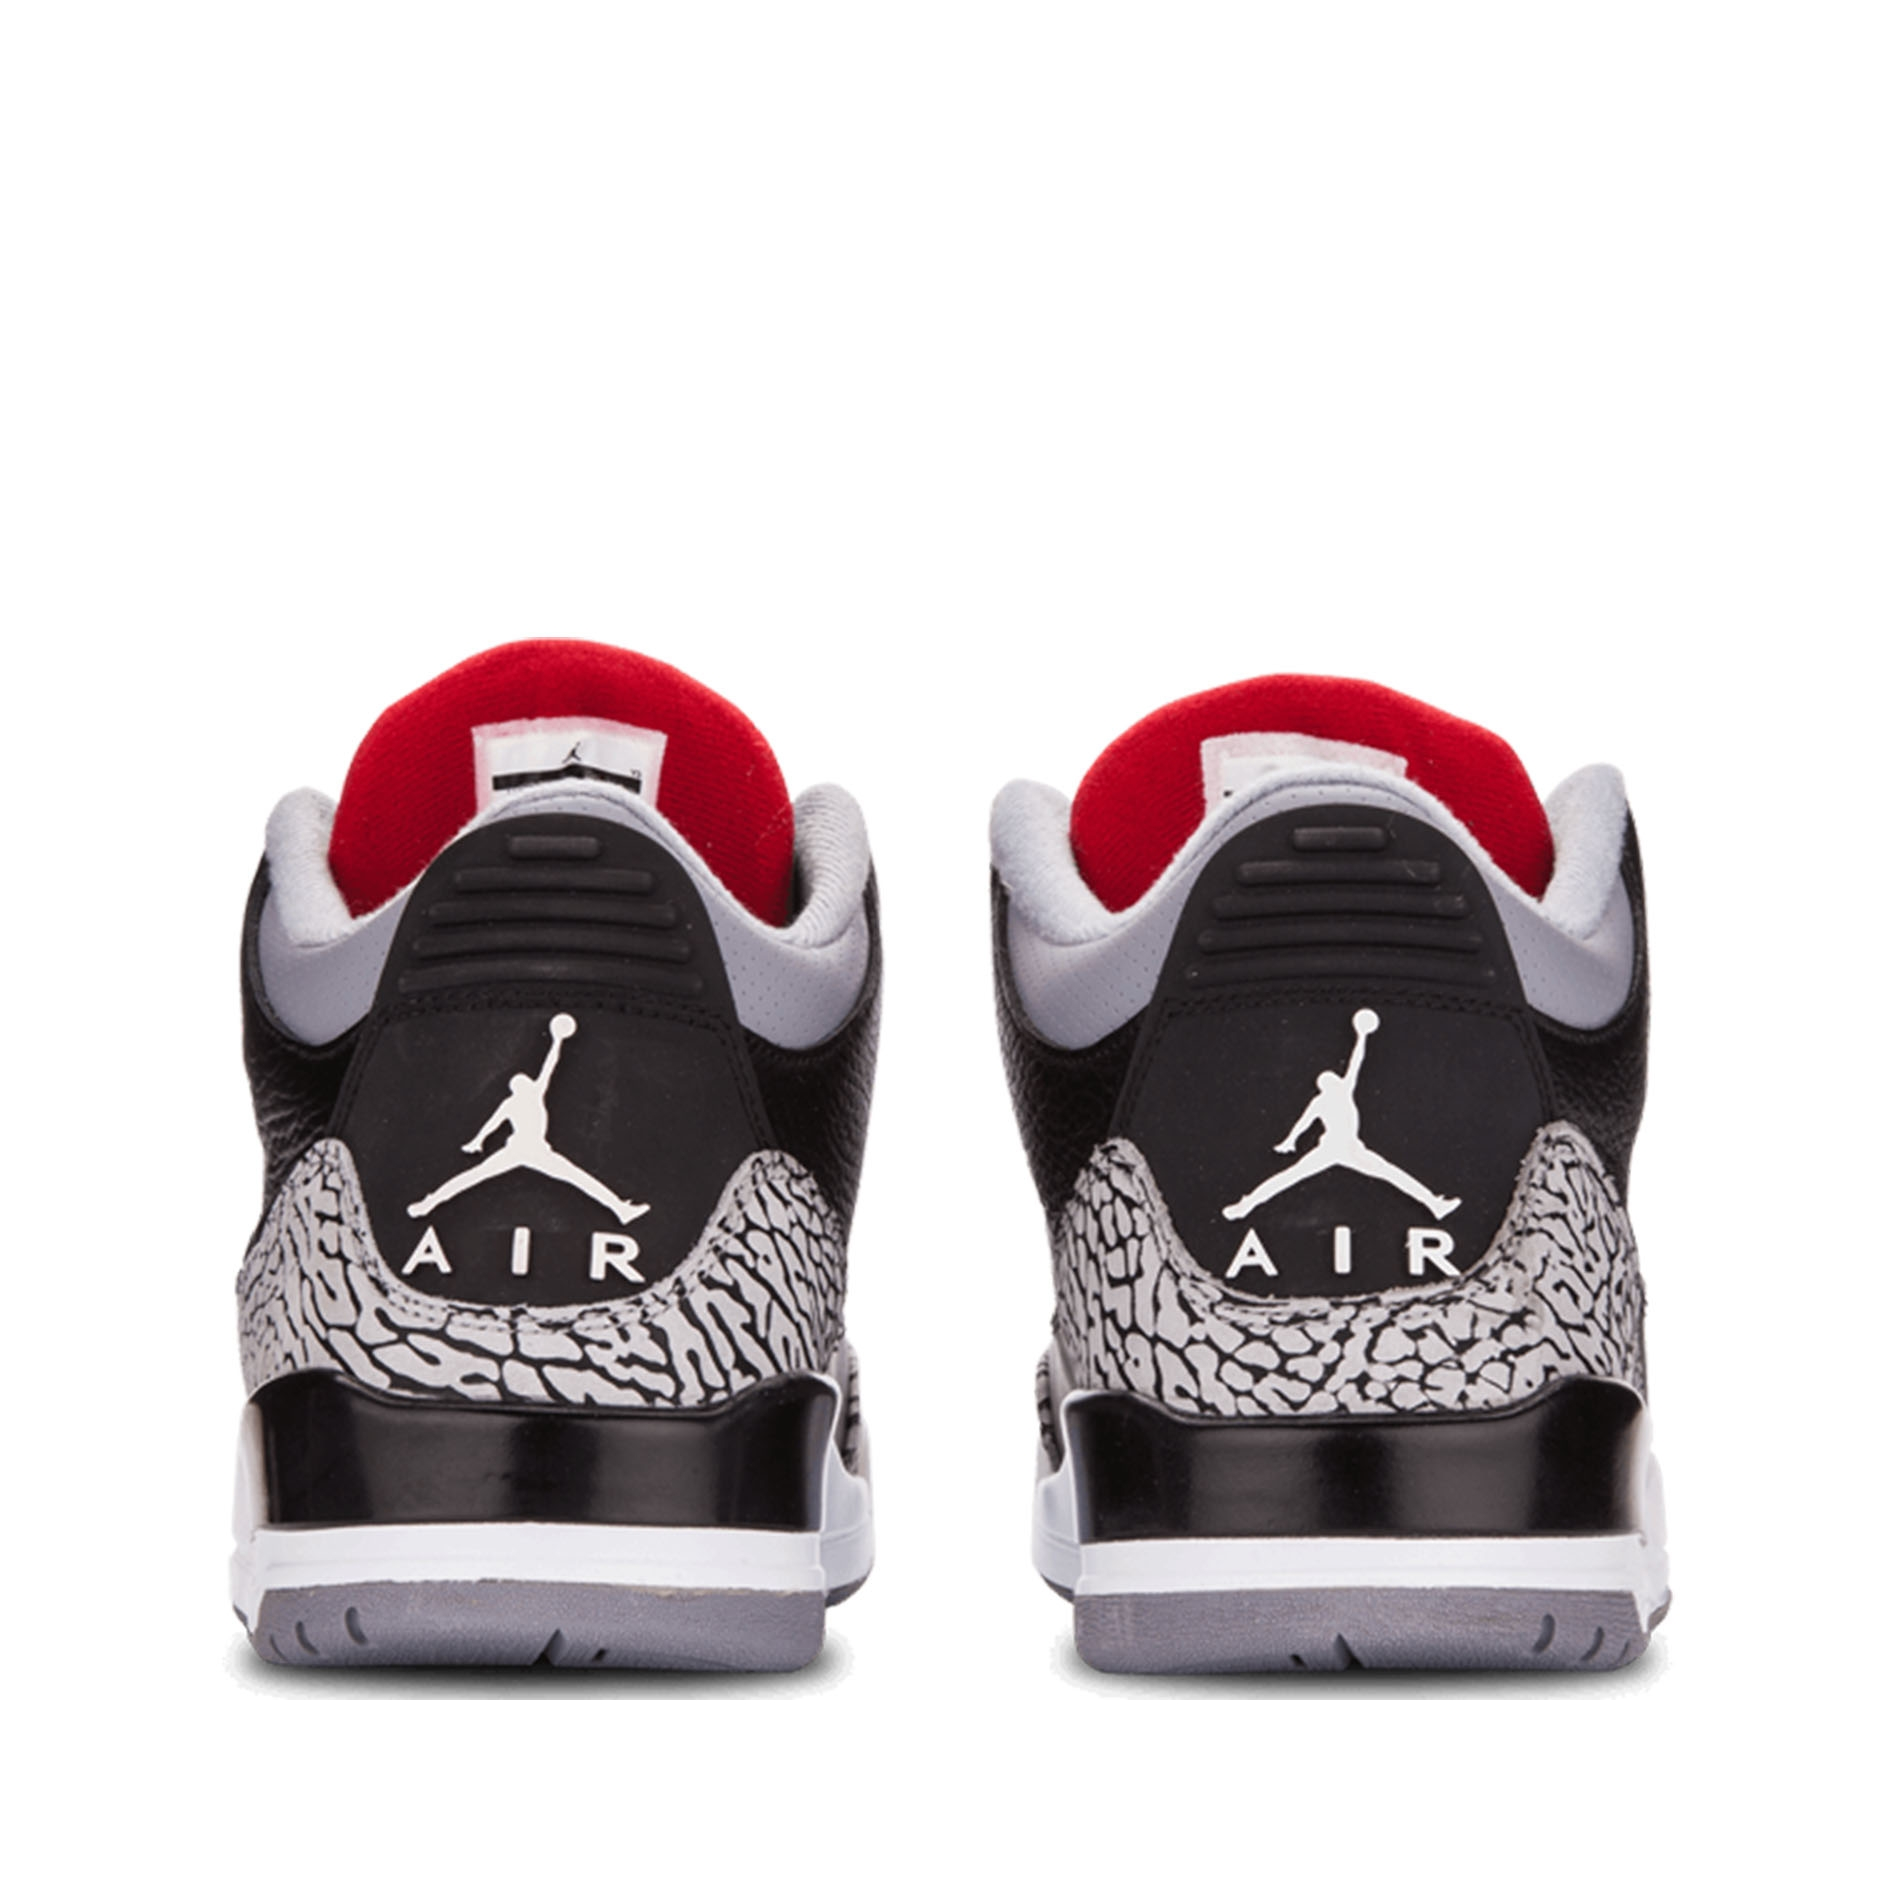 Nike Air Jordan 3 Retro III BLACK CEMENT 136064-010 black/varsity red-cement grey - Air Jordan 100% authentique xBiaY